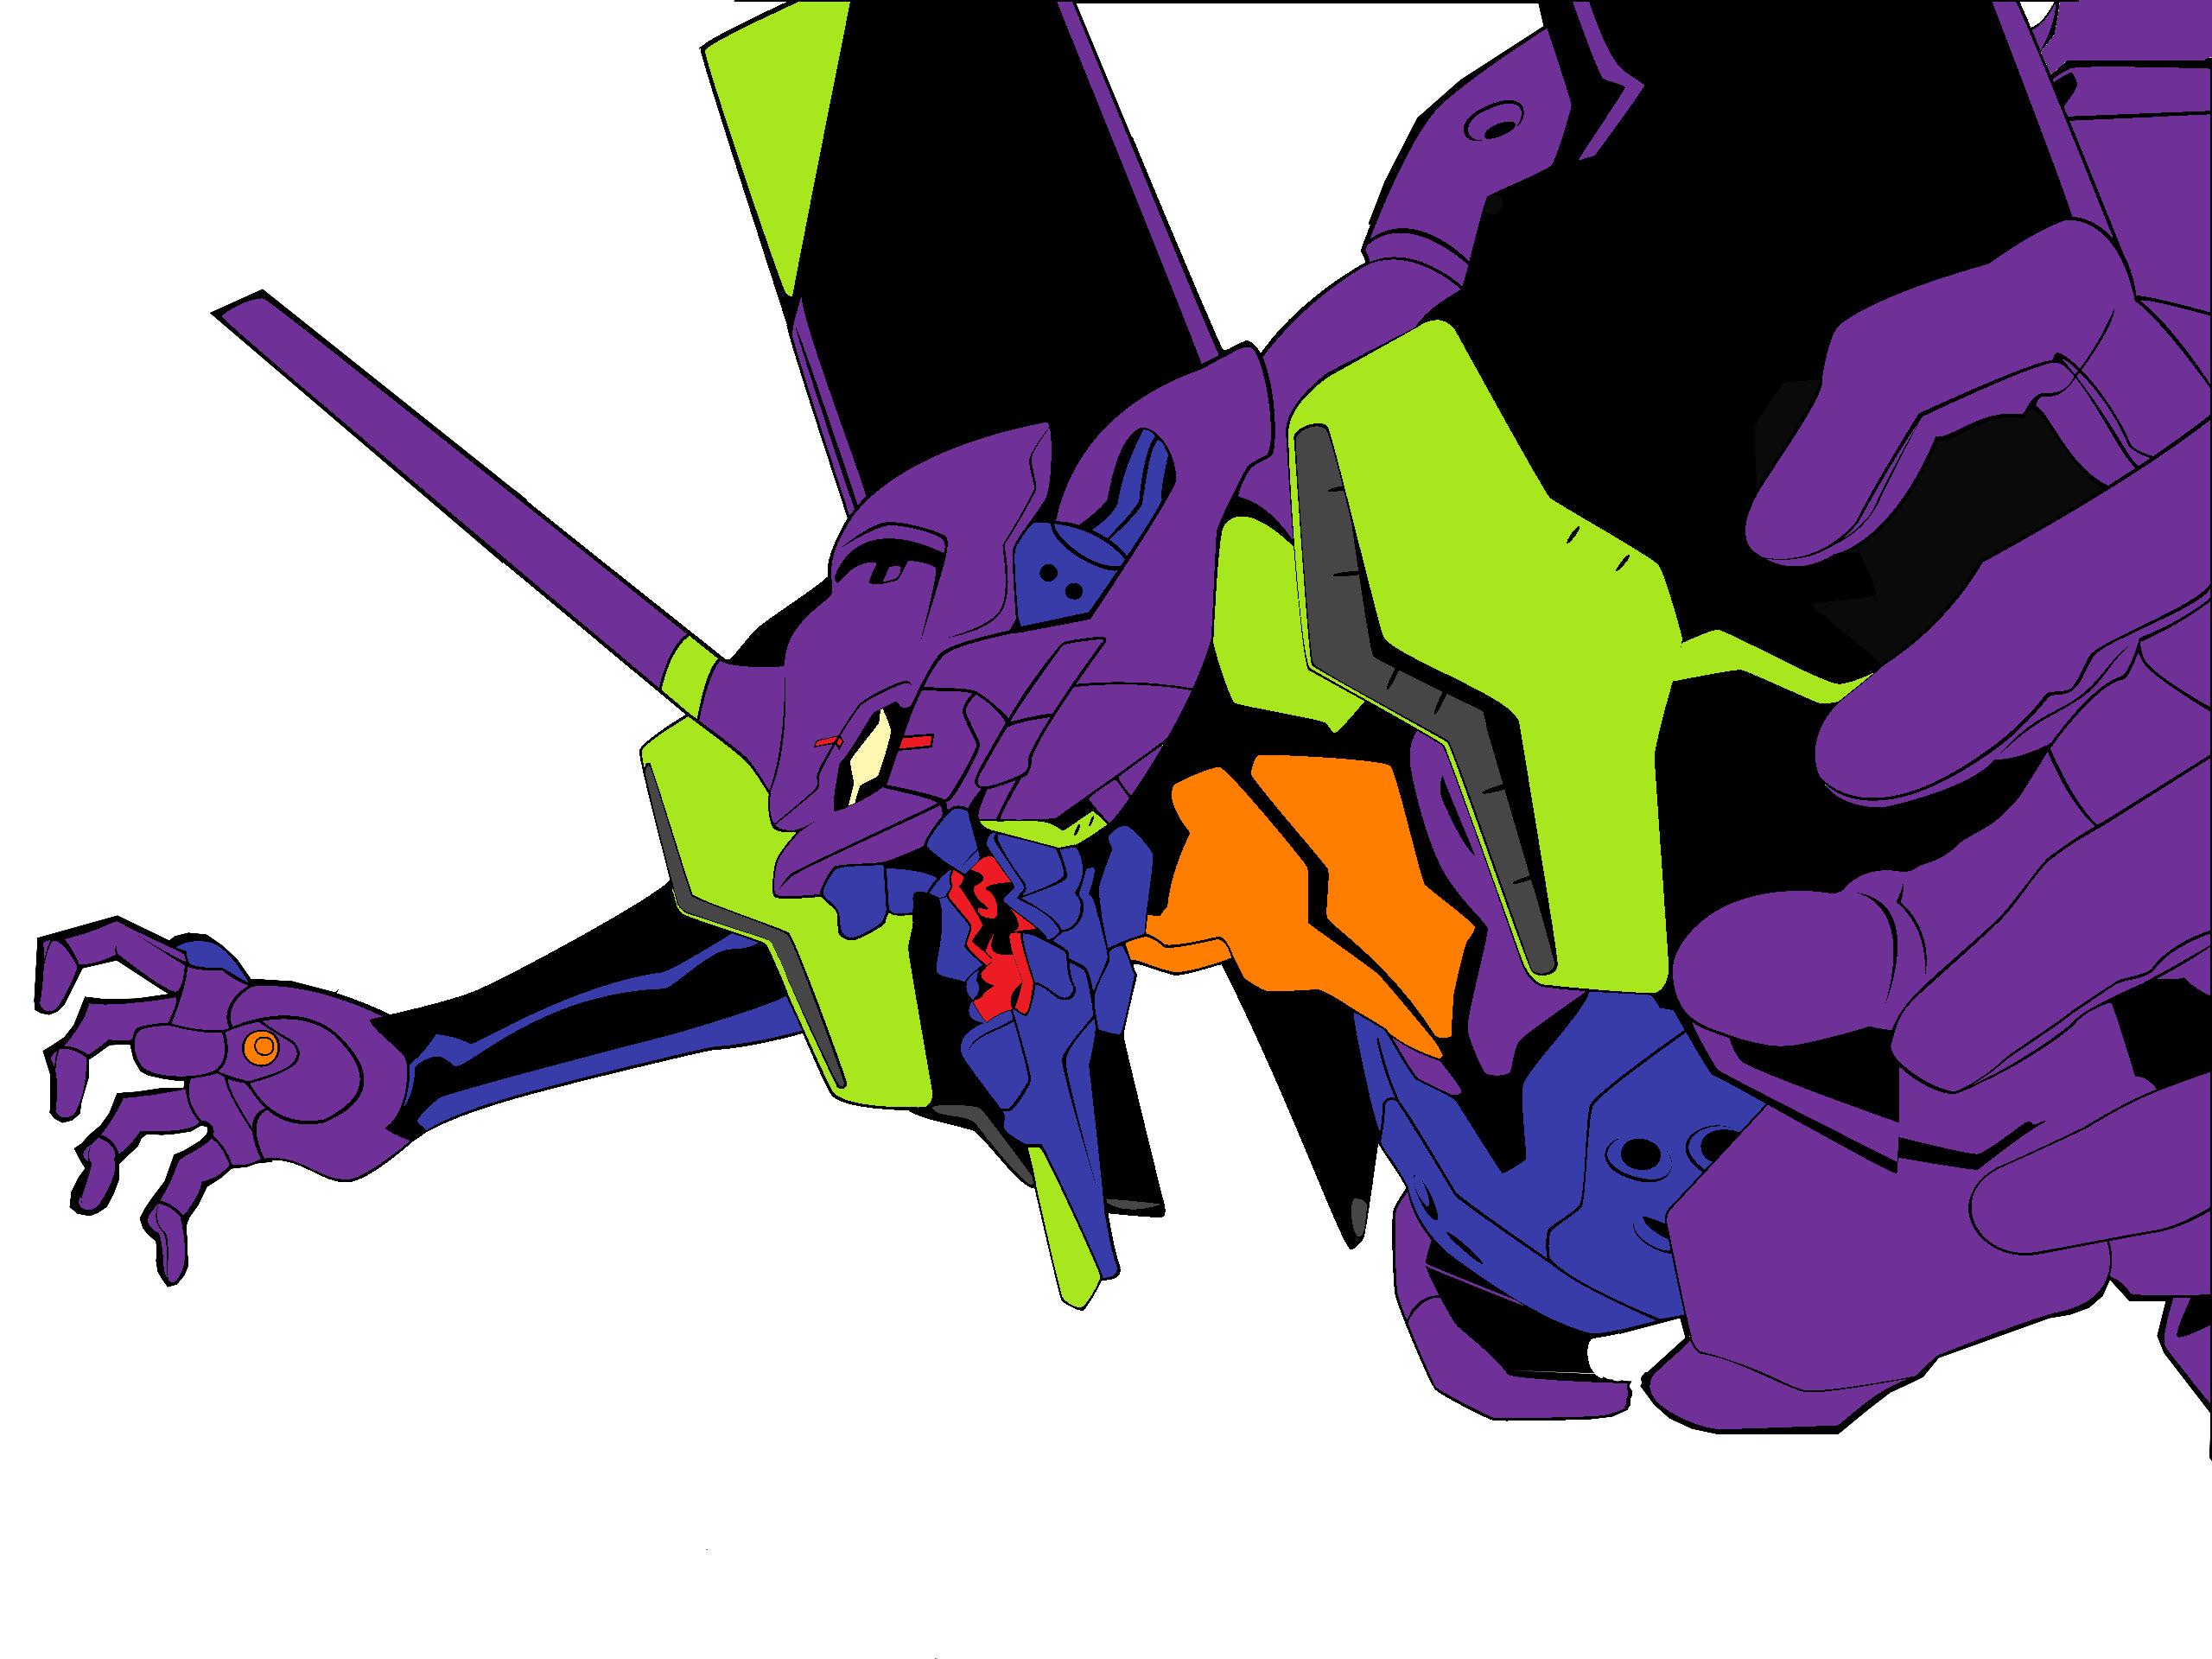 Anime 2560x1920 anime Neon Genesis Evangelion purple white background